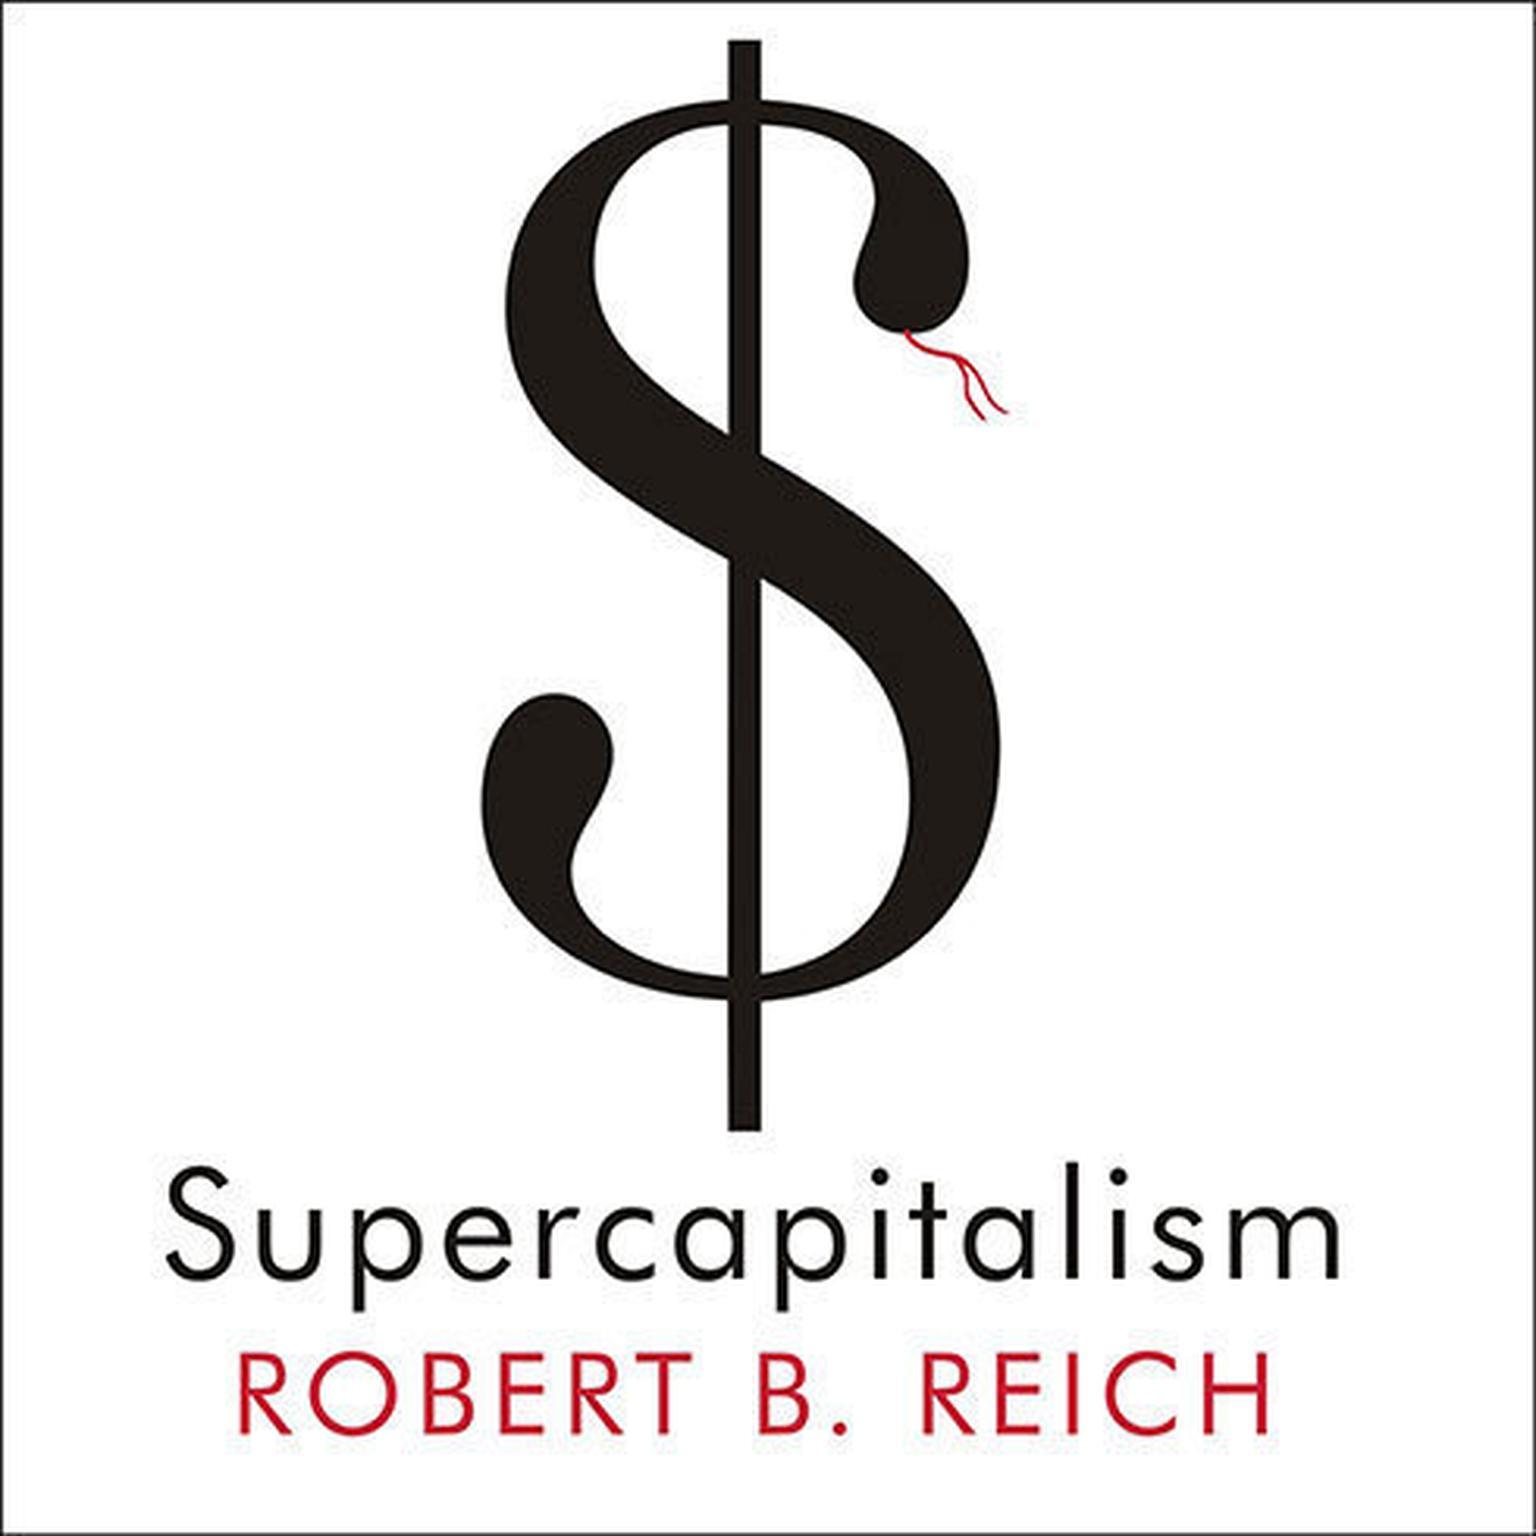 SUPERCAPITALISM ROBERT REICH EBOOK DOWNLOAD